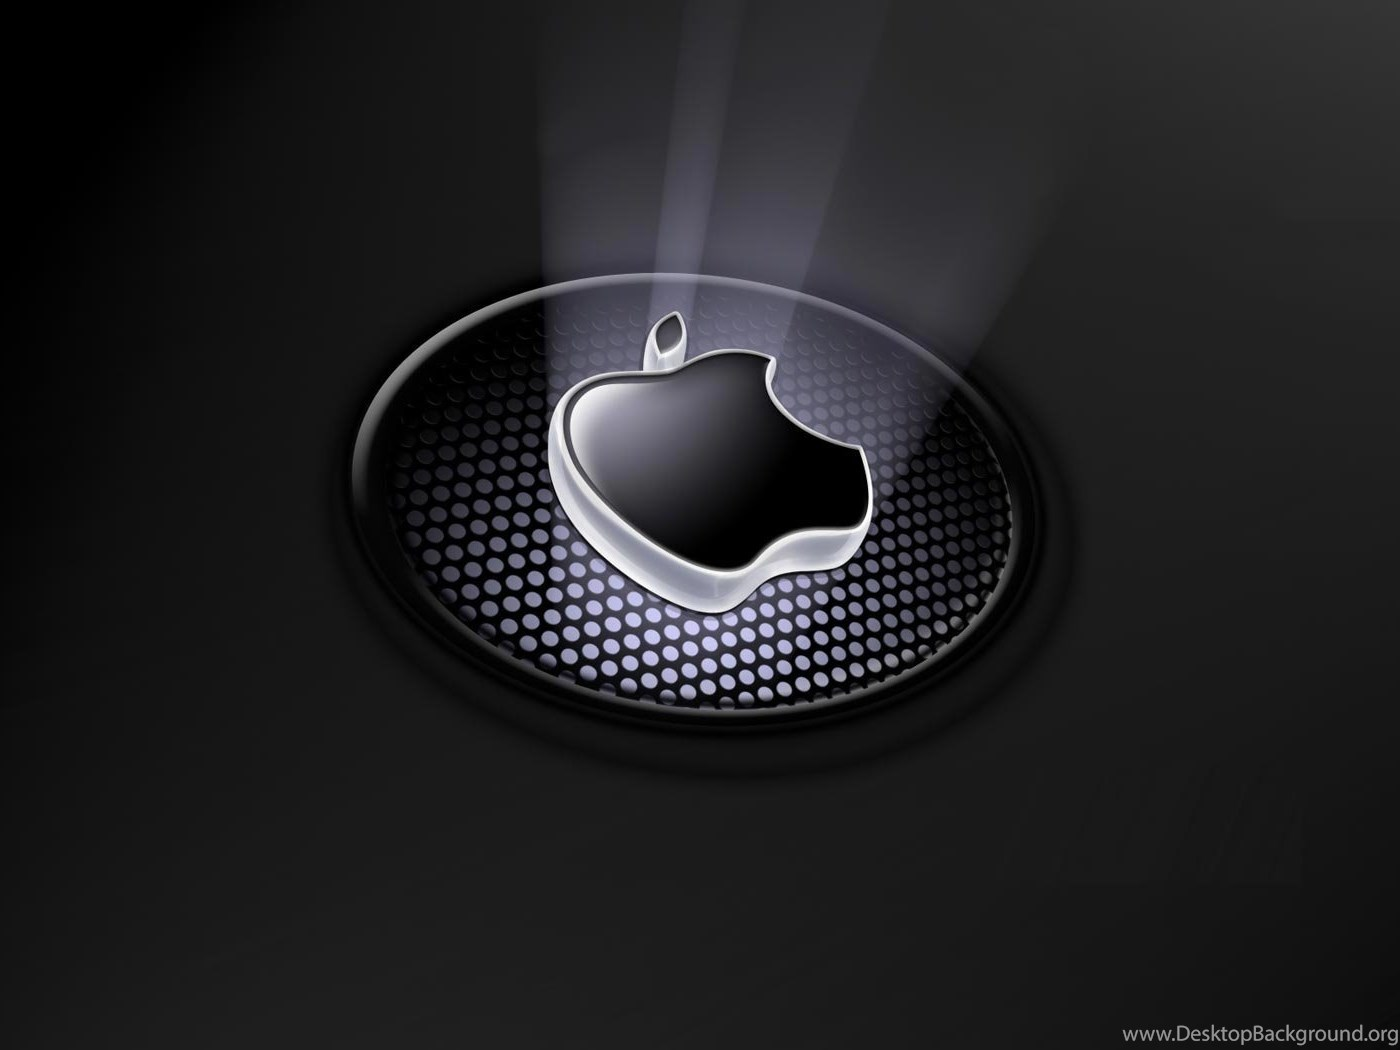 Apple Logo Wallpapers Hd Logo Brands For Free Hd 3d Desktop Background